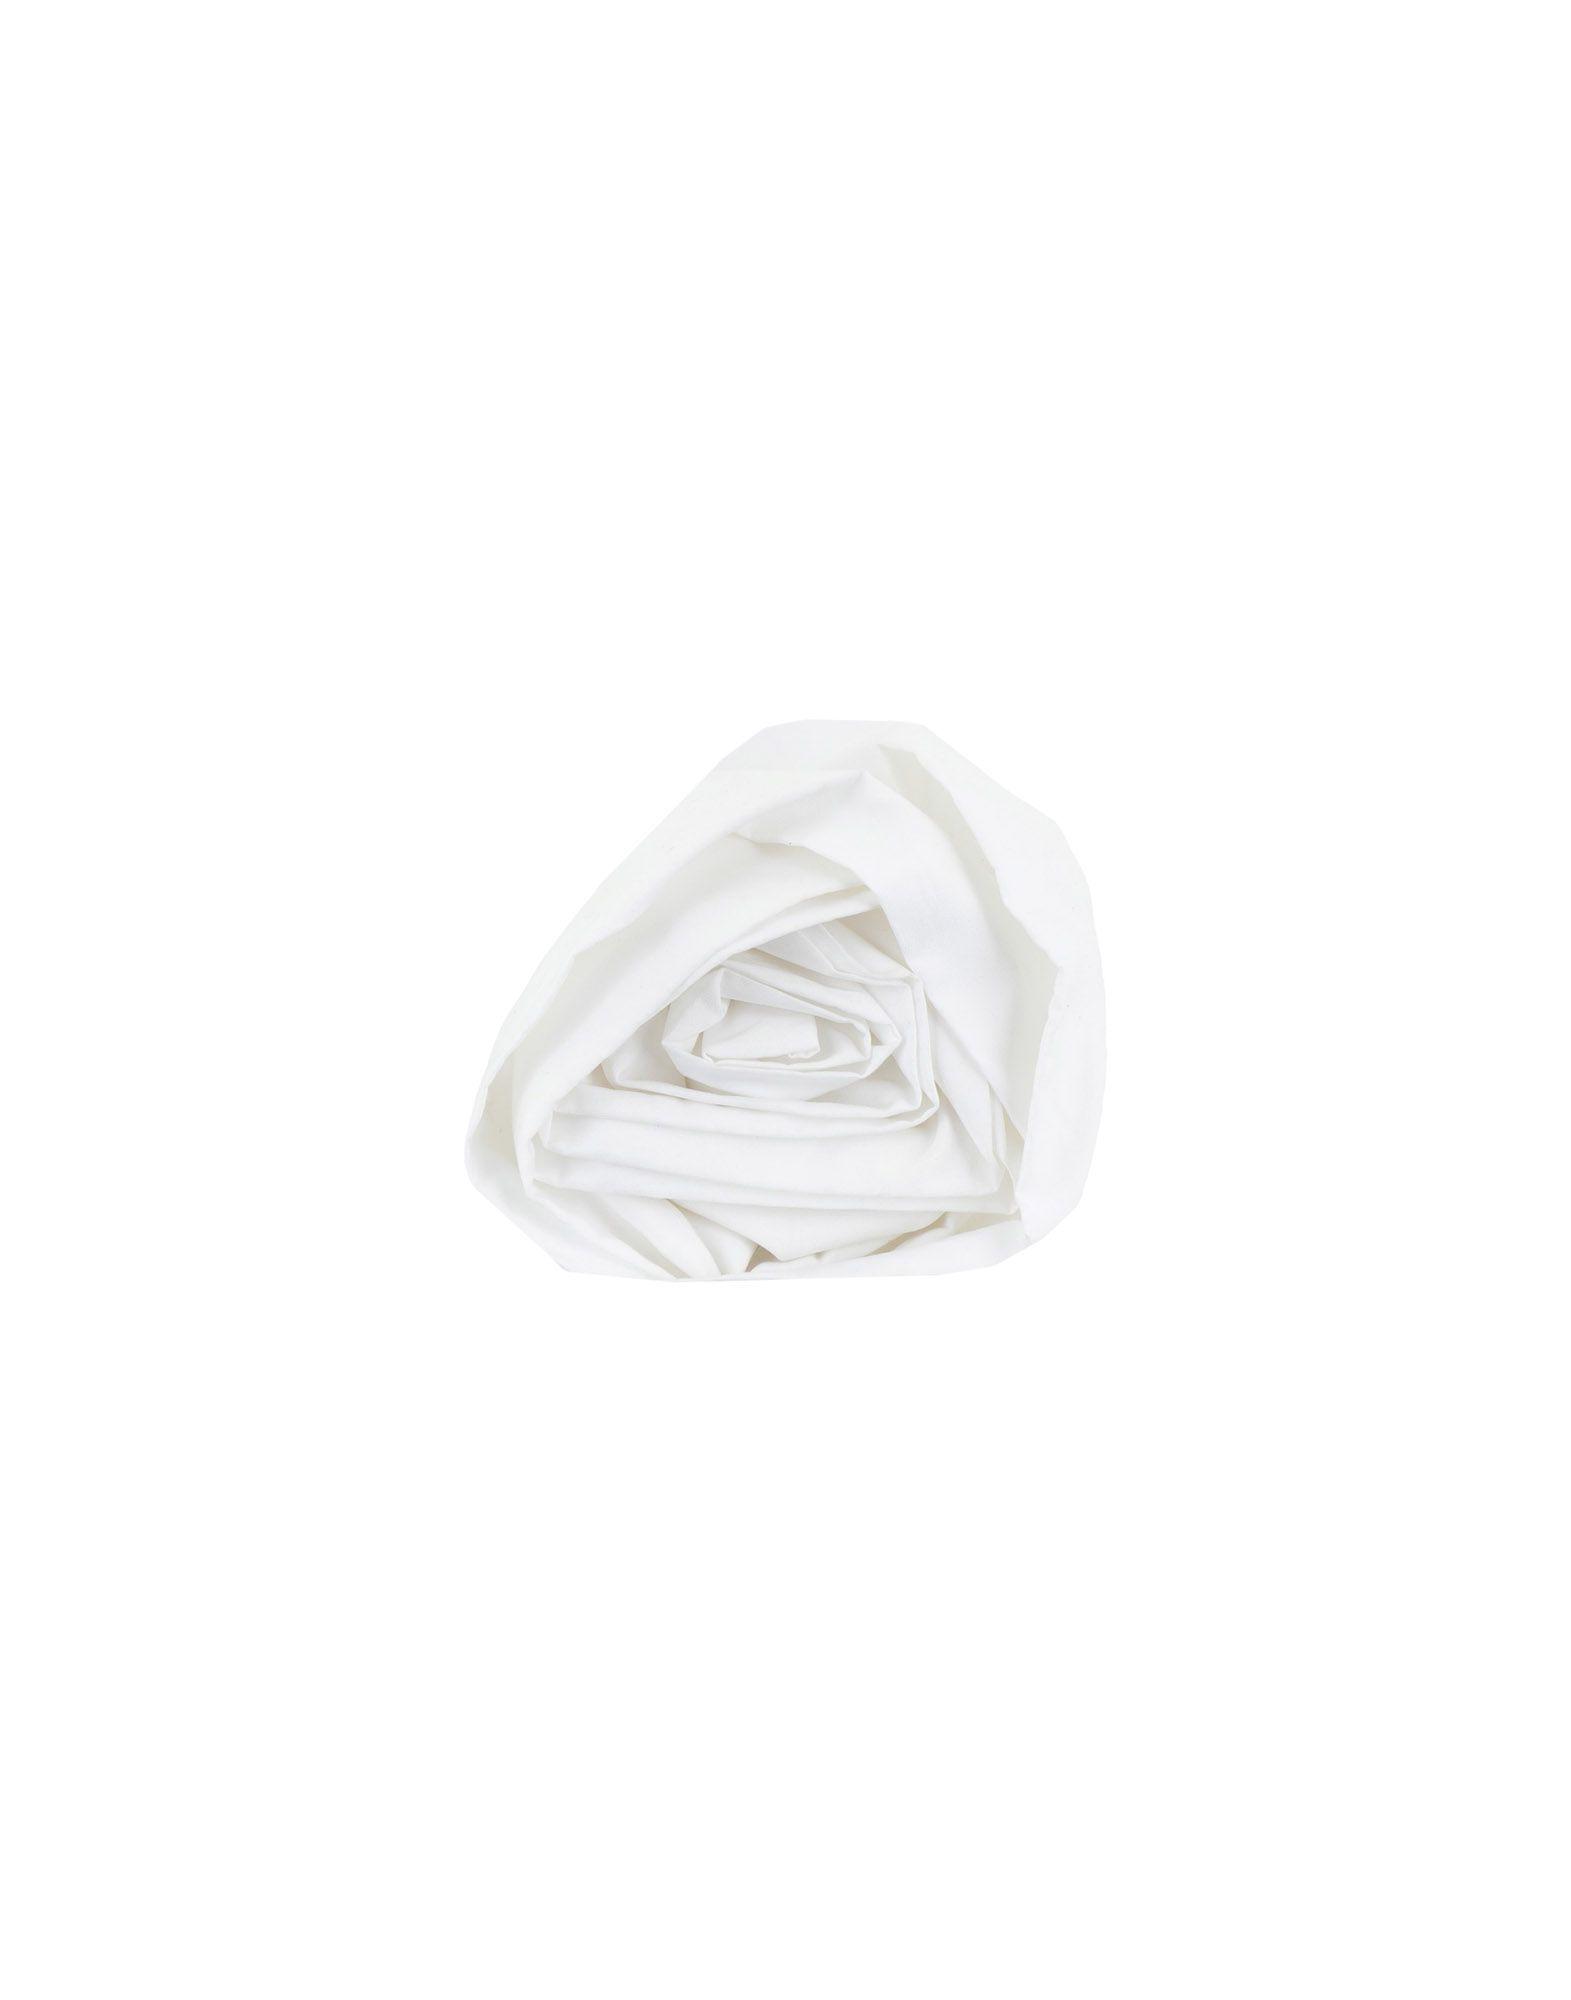 YOOX.COM(ユークス)《期間限定セール開催中!》ETRO レディース ブローチ ホワイト 紡績繊維 / 金属